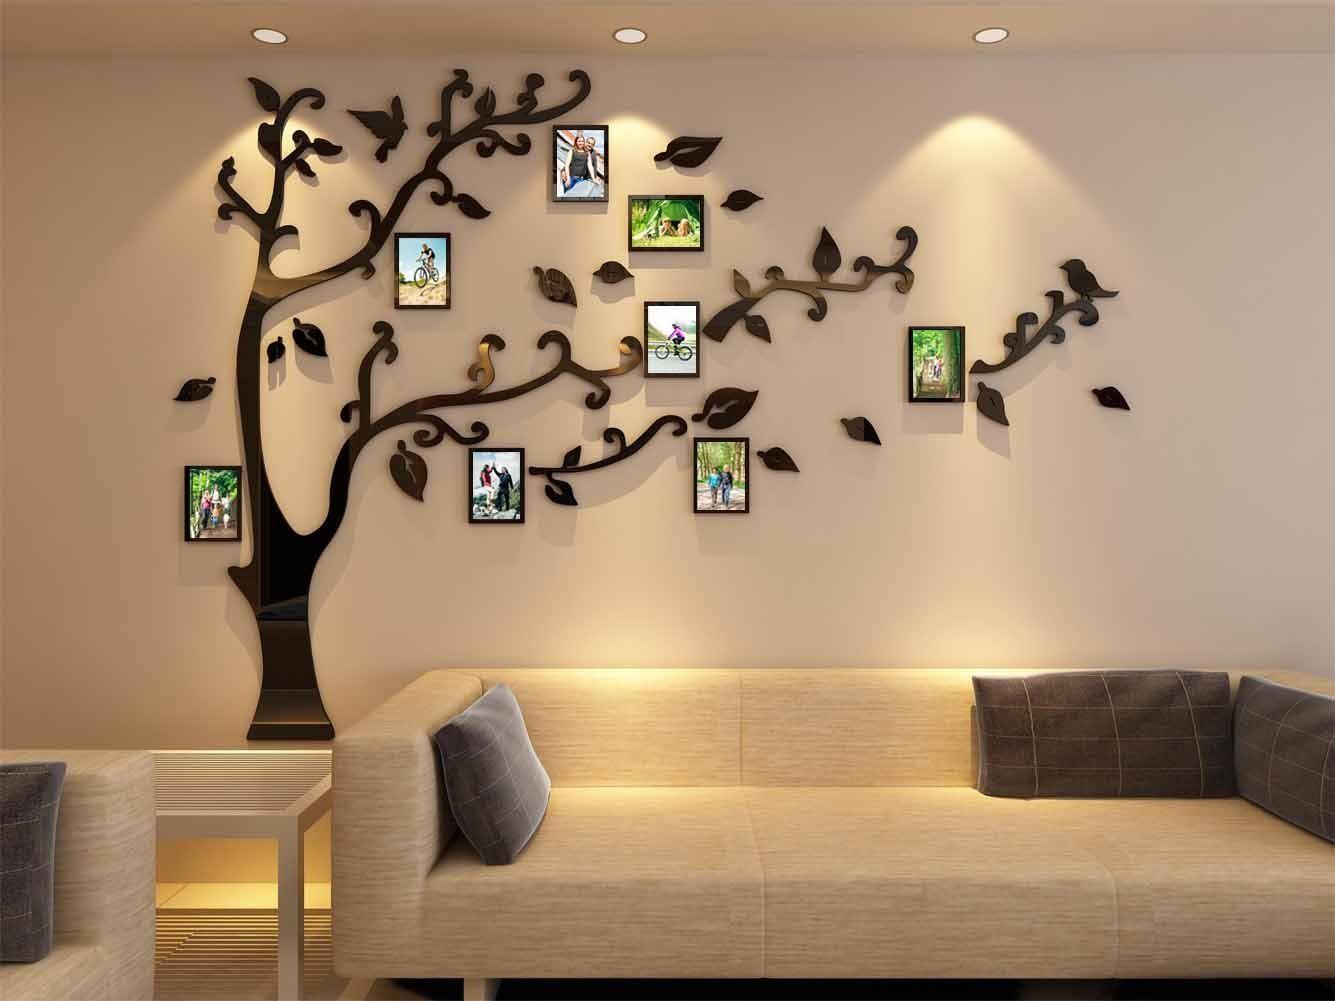 Amazon Com 3d Picture Frames Tree Wall Murals For Living Room Bedroom Sofa Backdrop Tv Wall Background O Tree Wall Murals Wall Decor Amazon Wall Decor Decals